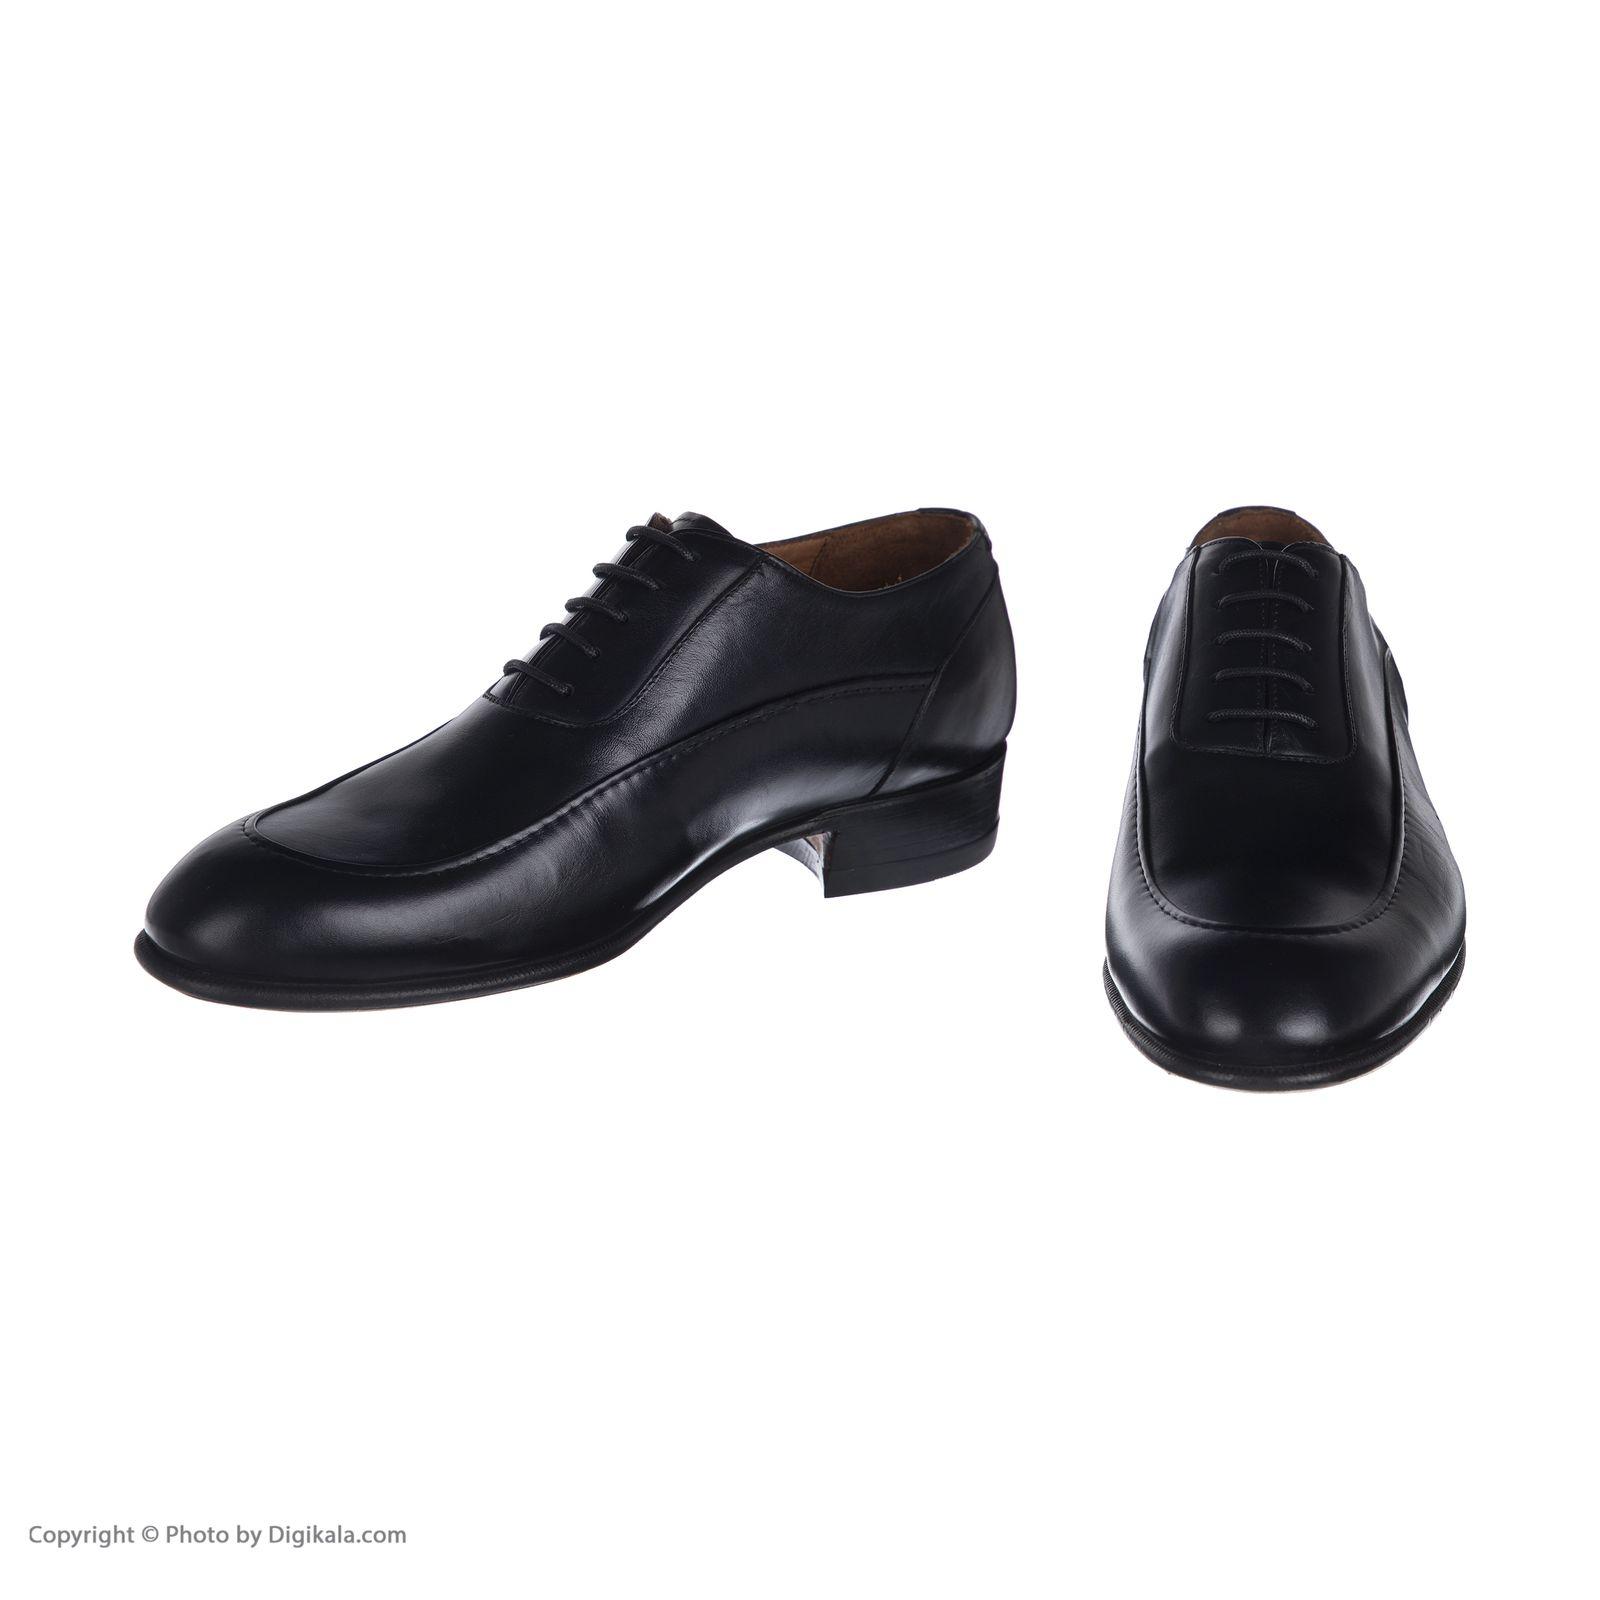 کفش مردانه نظری کد 425 -  - 4